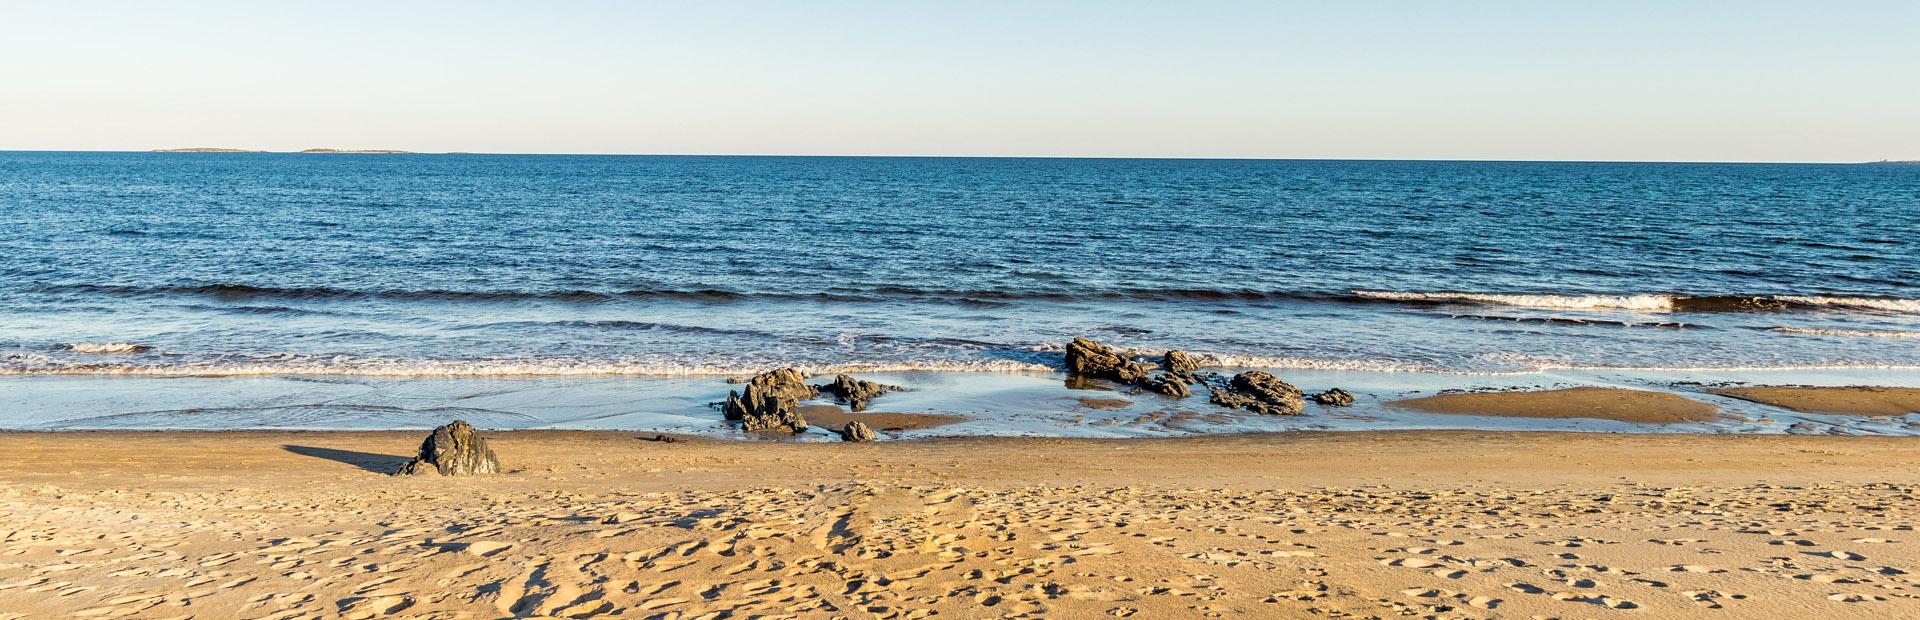 Maine vacation rental, Old Orchard Beach, ocean scene, Maine.